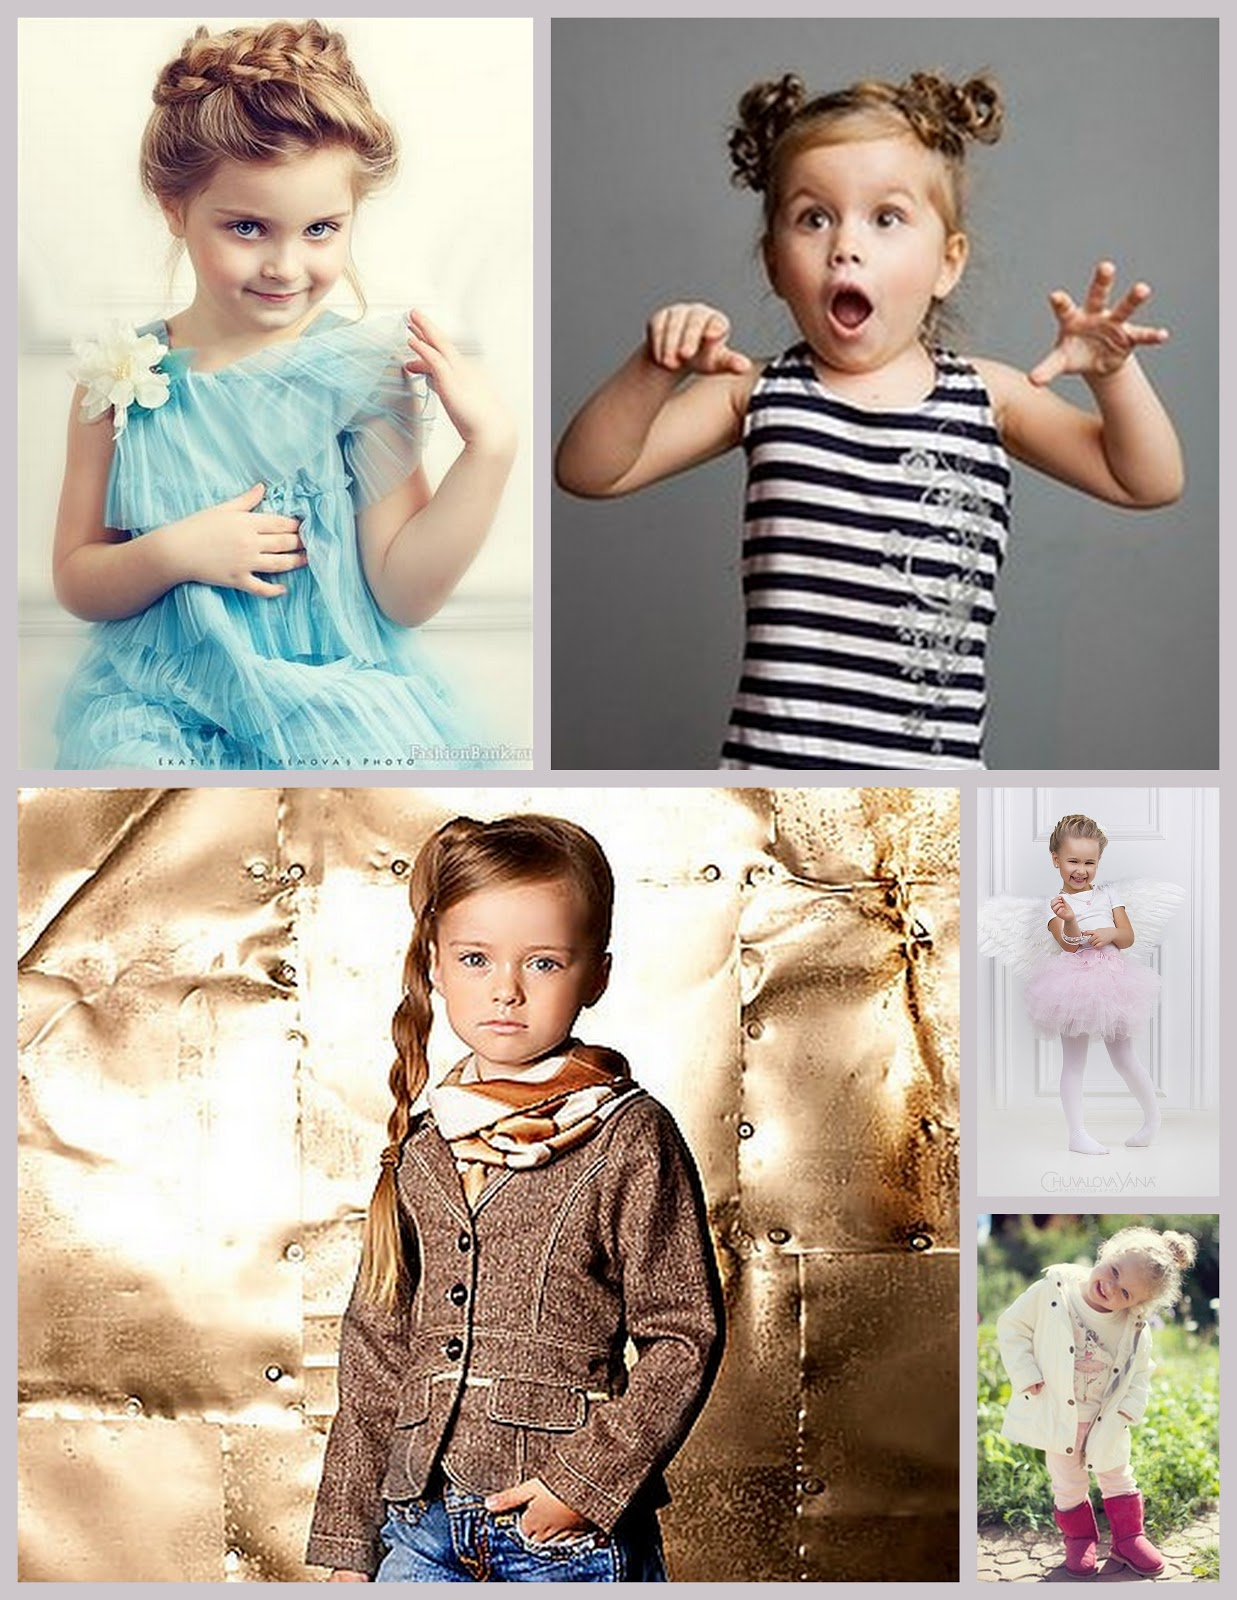 Excellent Childrenhairstyles22 Toddler Hairdos Braids And Updos Short Hairstyles For Black Women Fulllsitofus